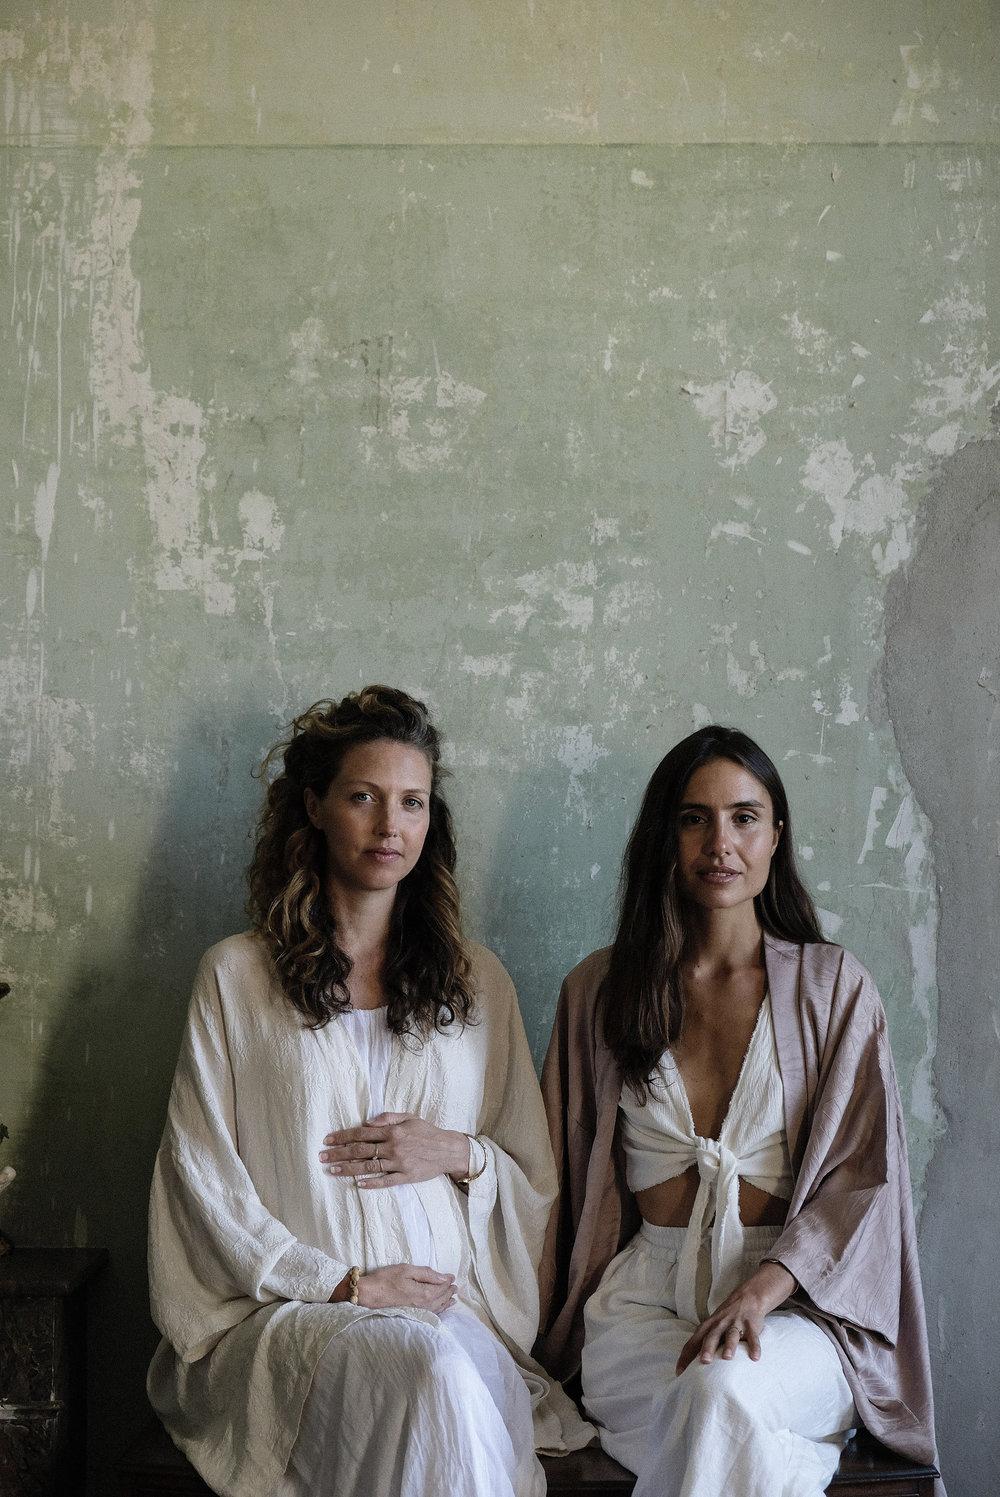 Erica Jago & Jade Christina for One Oneness